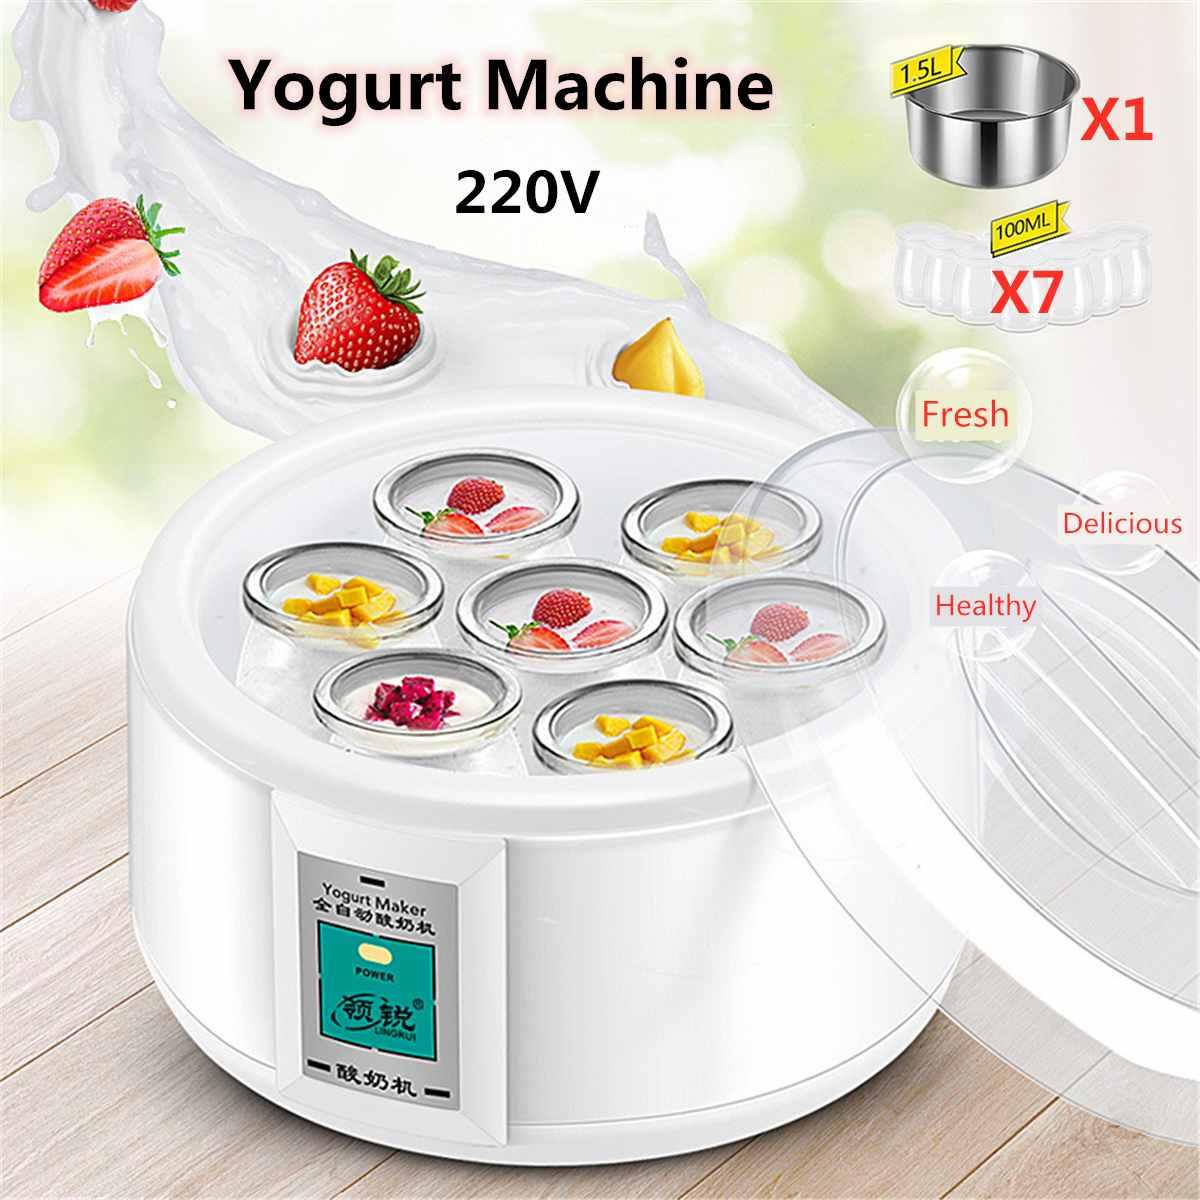 1.5L Automatic Yogurt Maker with 7 Jars Electric Yogurt Maker Yogurt DIY Tool Kitchen Appliances Liner Material Stainless Steel